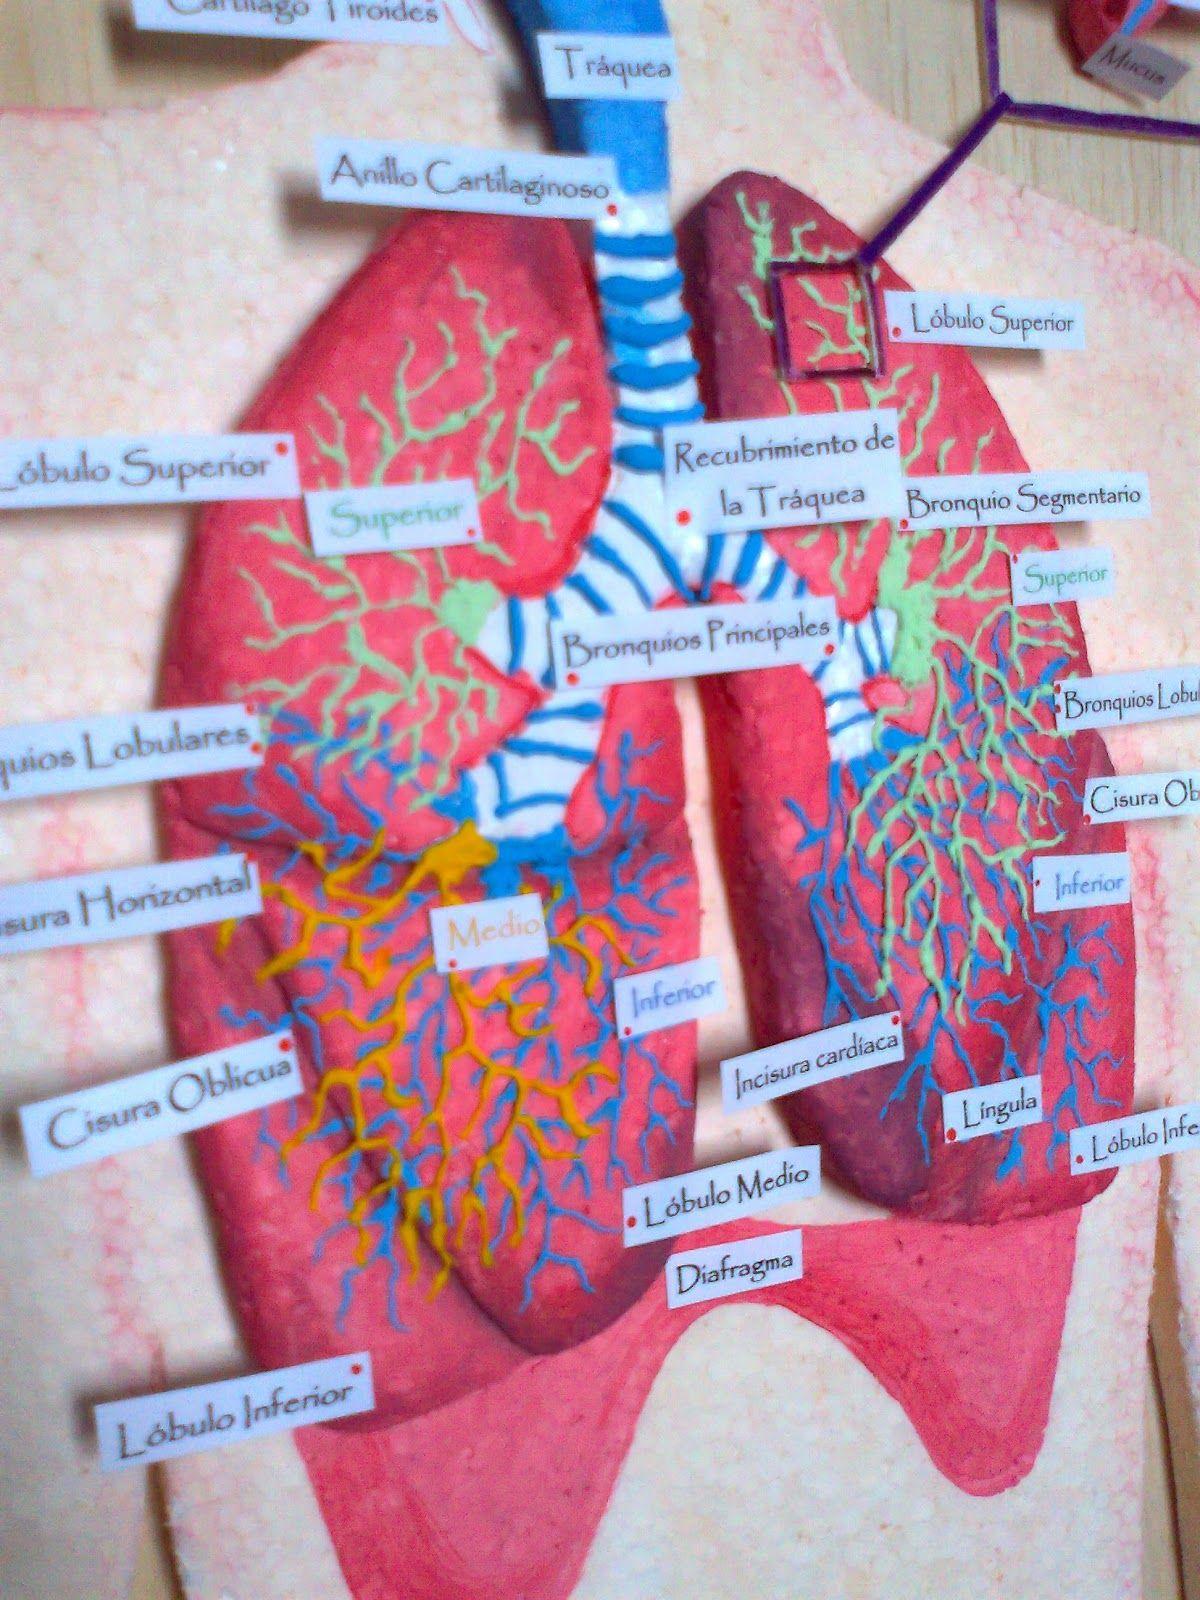 Maquetas Y Arte Aparato Respiratorio Maqueta Del Sistema Respiratorio Maqueta Del Aparato Respiratorio Maqueta Del Sistema Digestivo